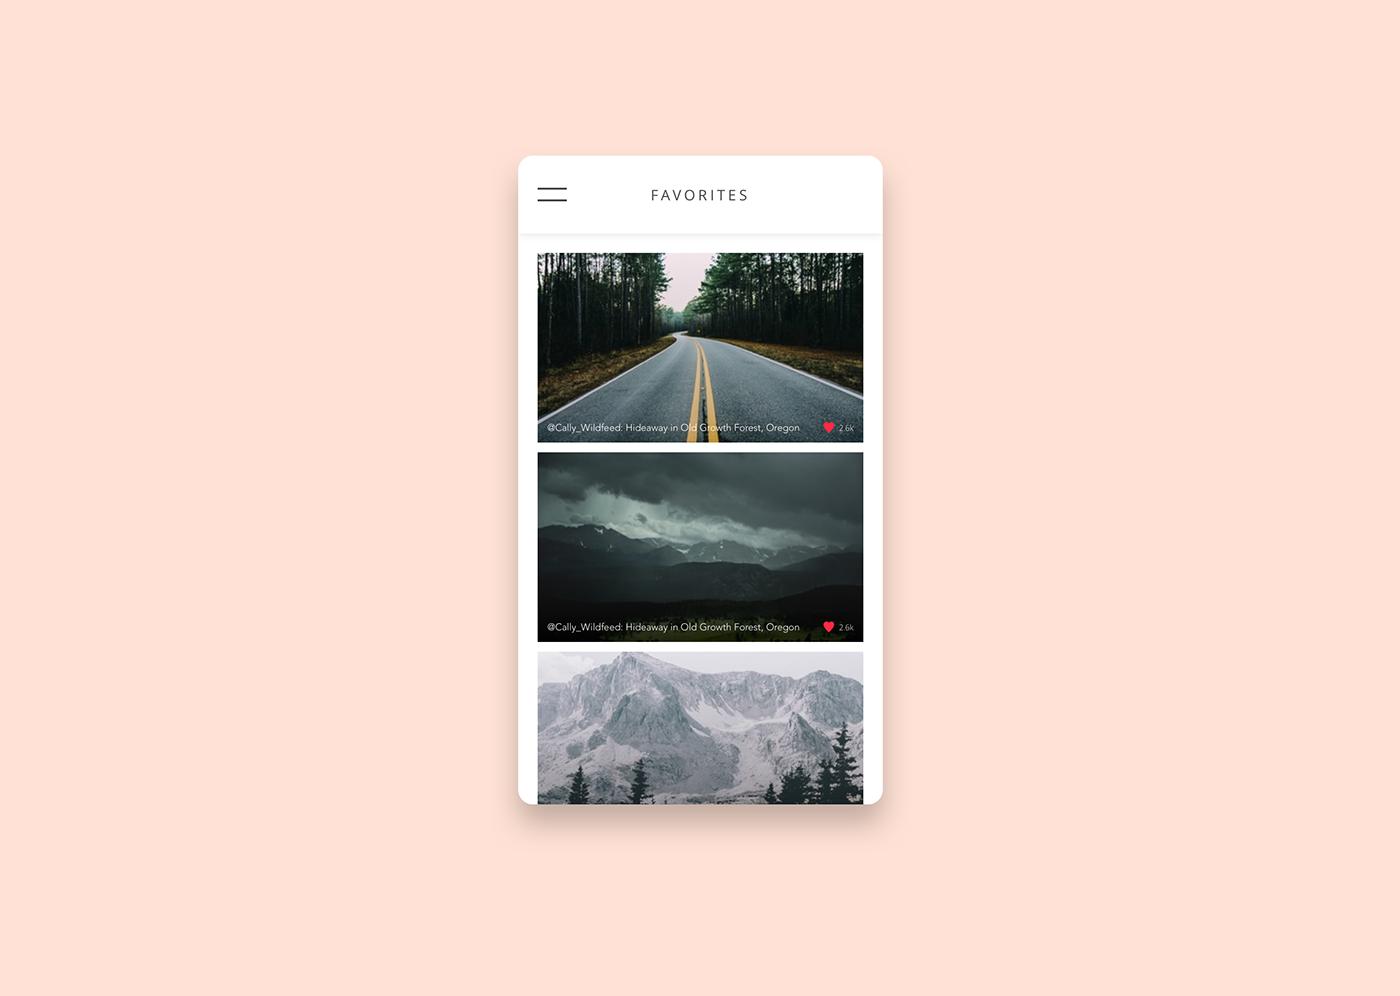 favorites app photos feed UI ux Interface design Webdesign daily ui